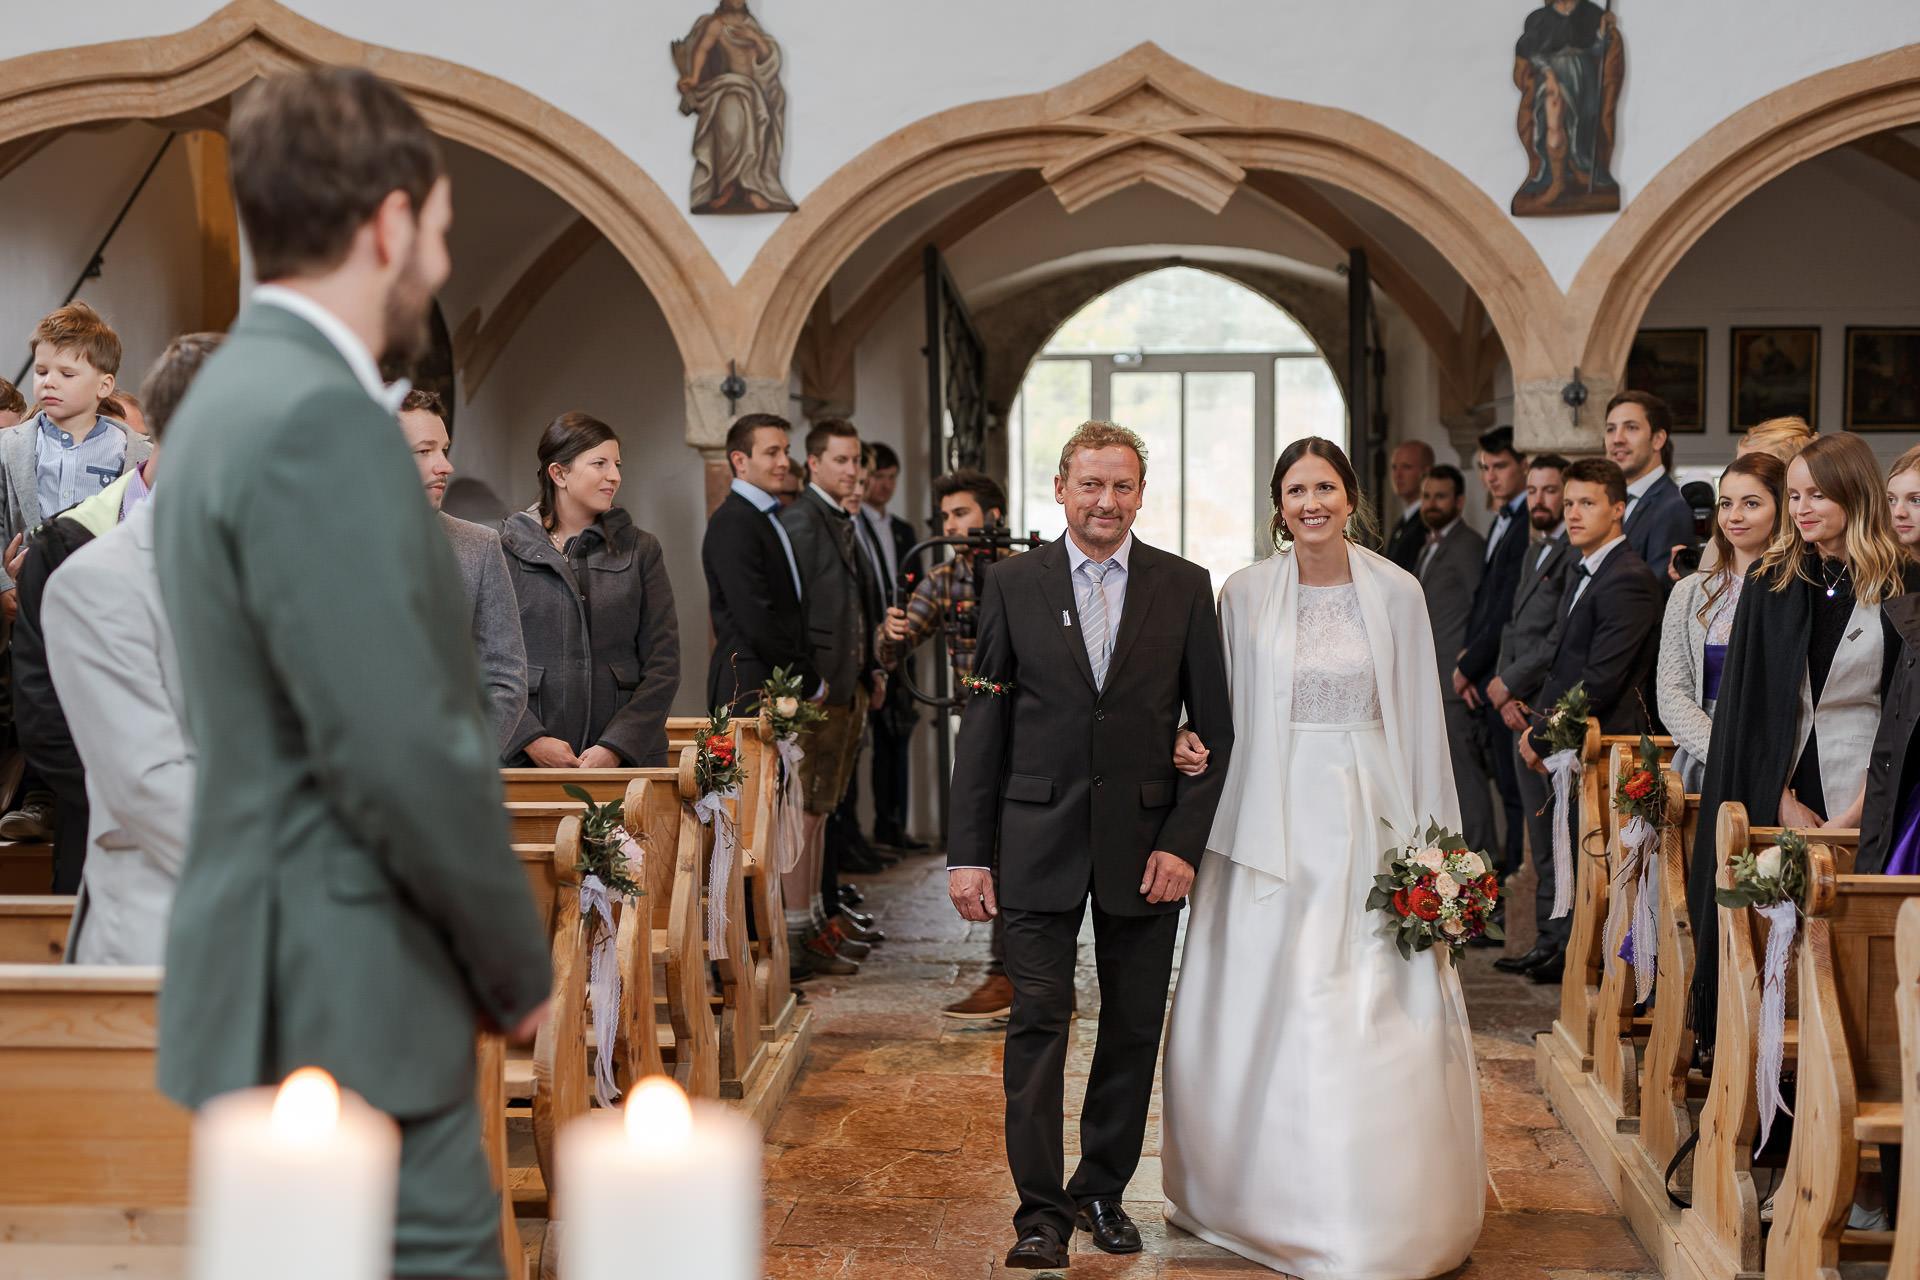 Verena & Manuel Photography | Hochzeitsfotos | Hochzeitsfotograf Graz | Hochzeitsfotograf Steiermark | Hochzeitsfotografen Österreich